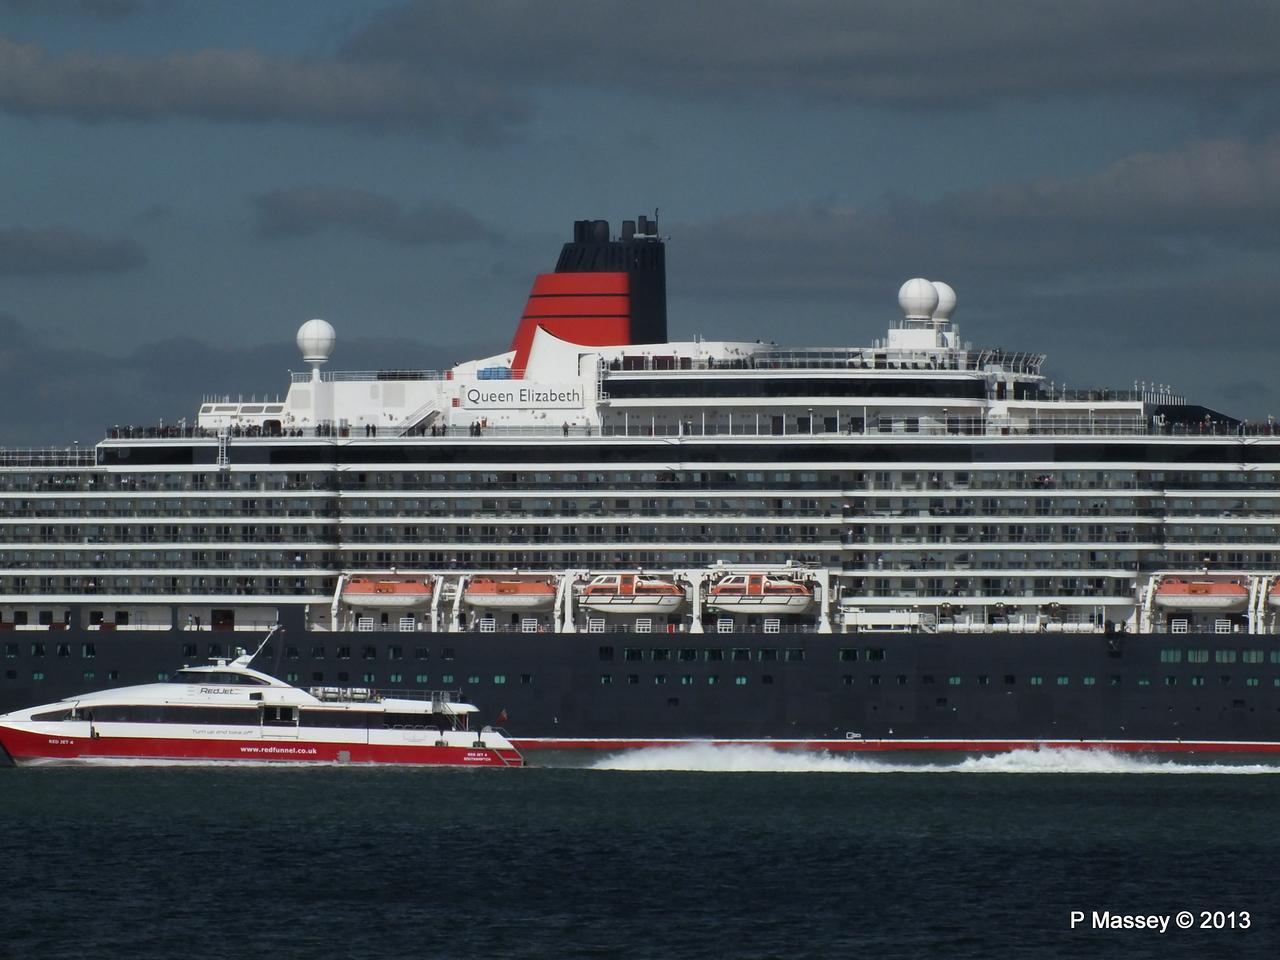 QUEEN ELIZABETH Departs Southampton PDM 09-06-2013 16-56-12